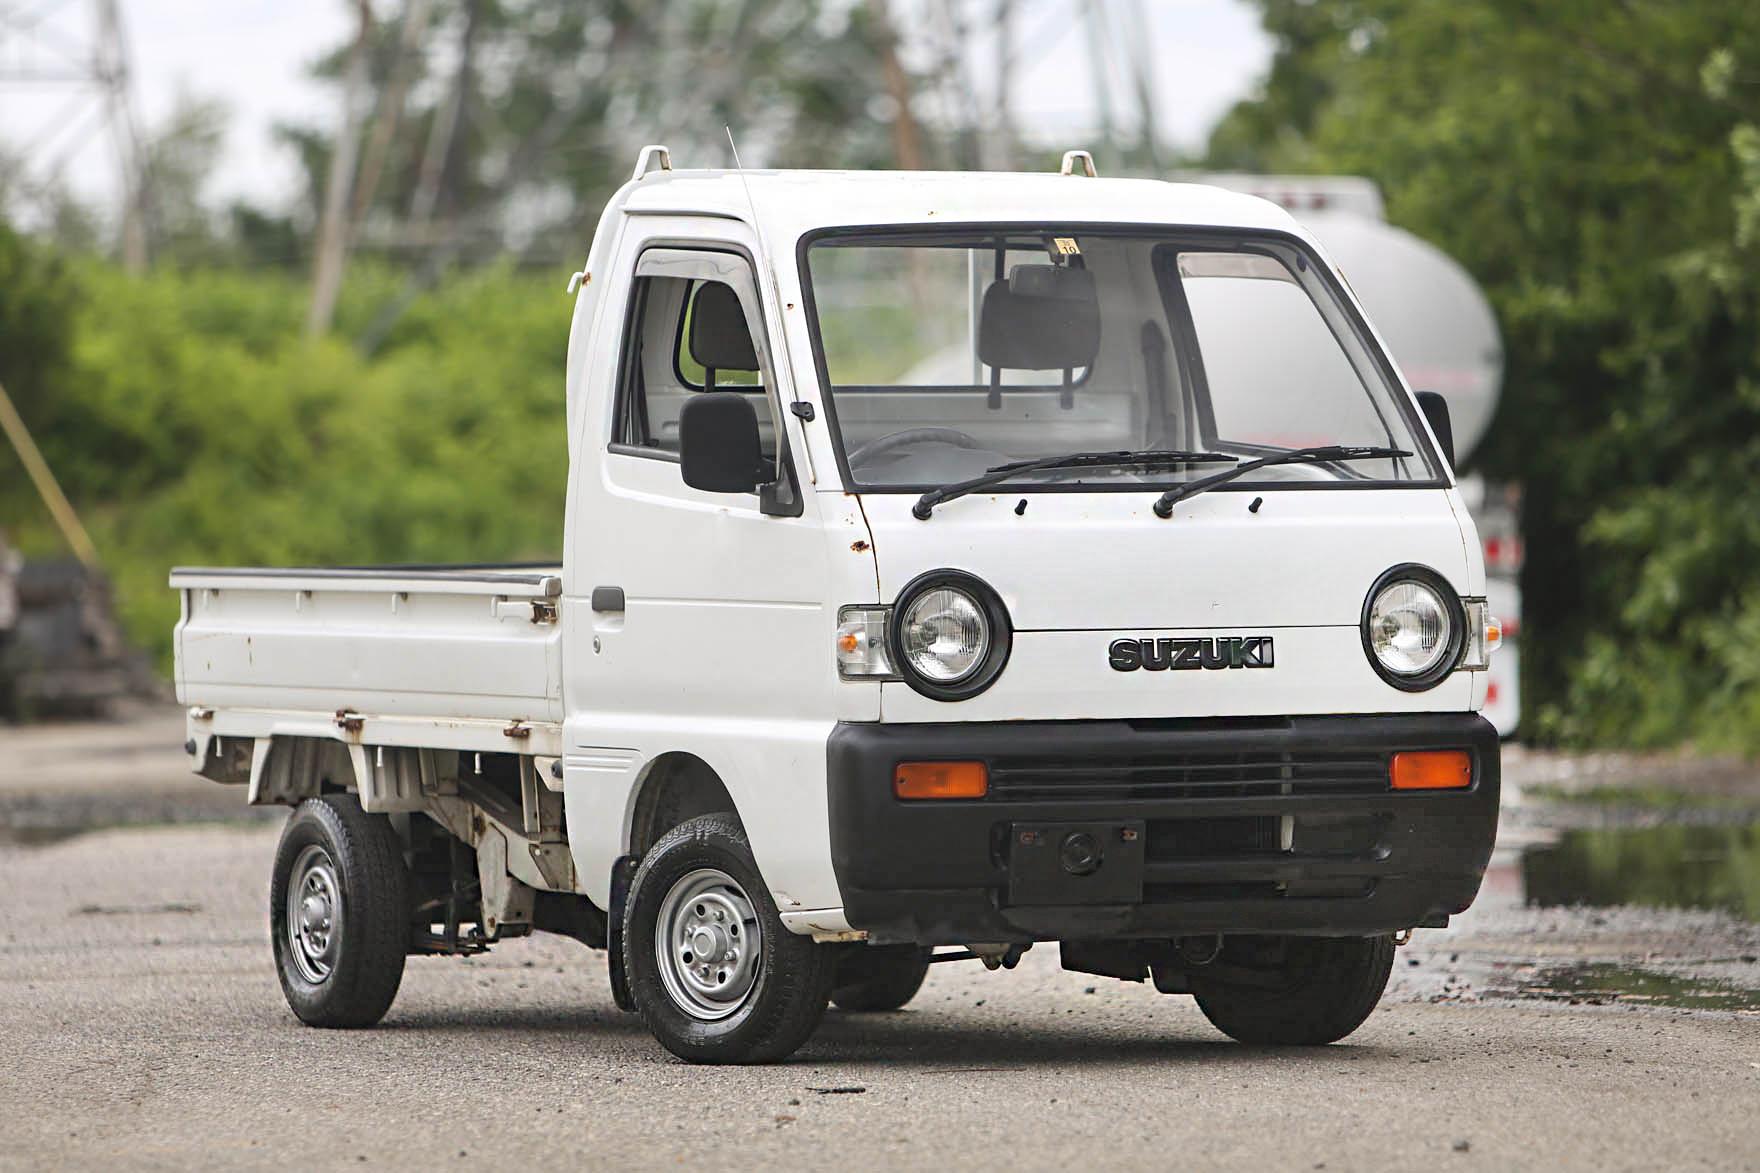 1993 Suzuki Carry 2WD - $3,750